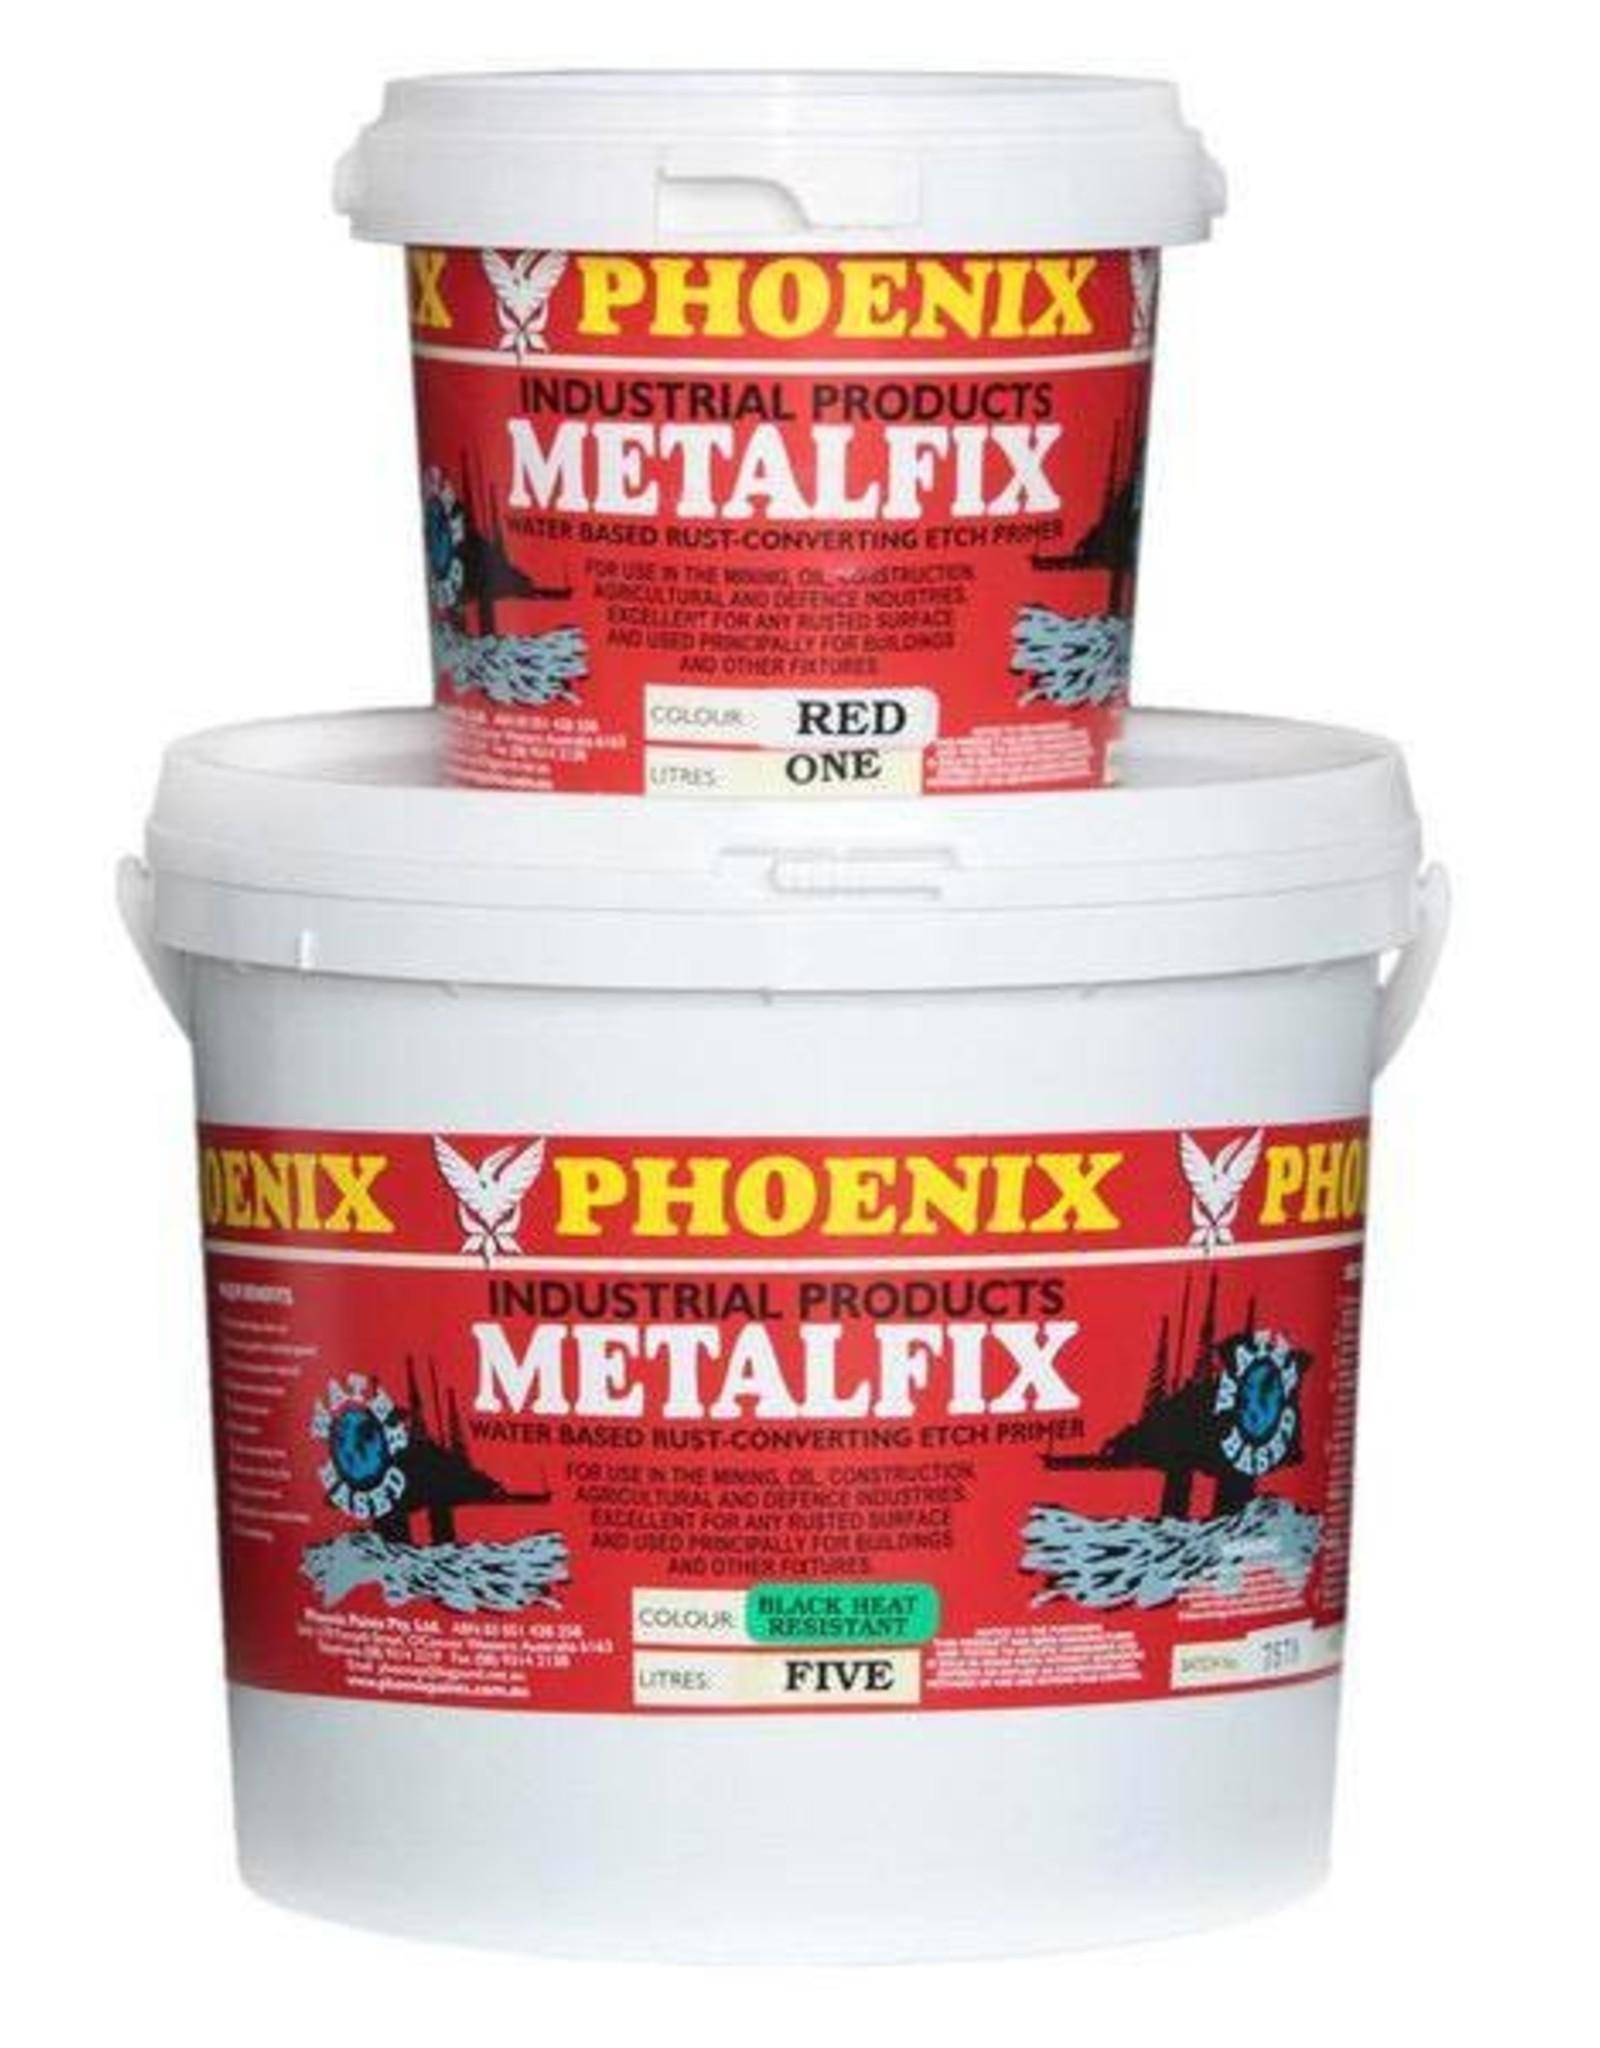 PHOENIX Metalfix